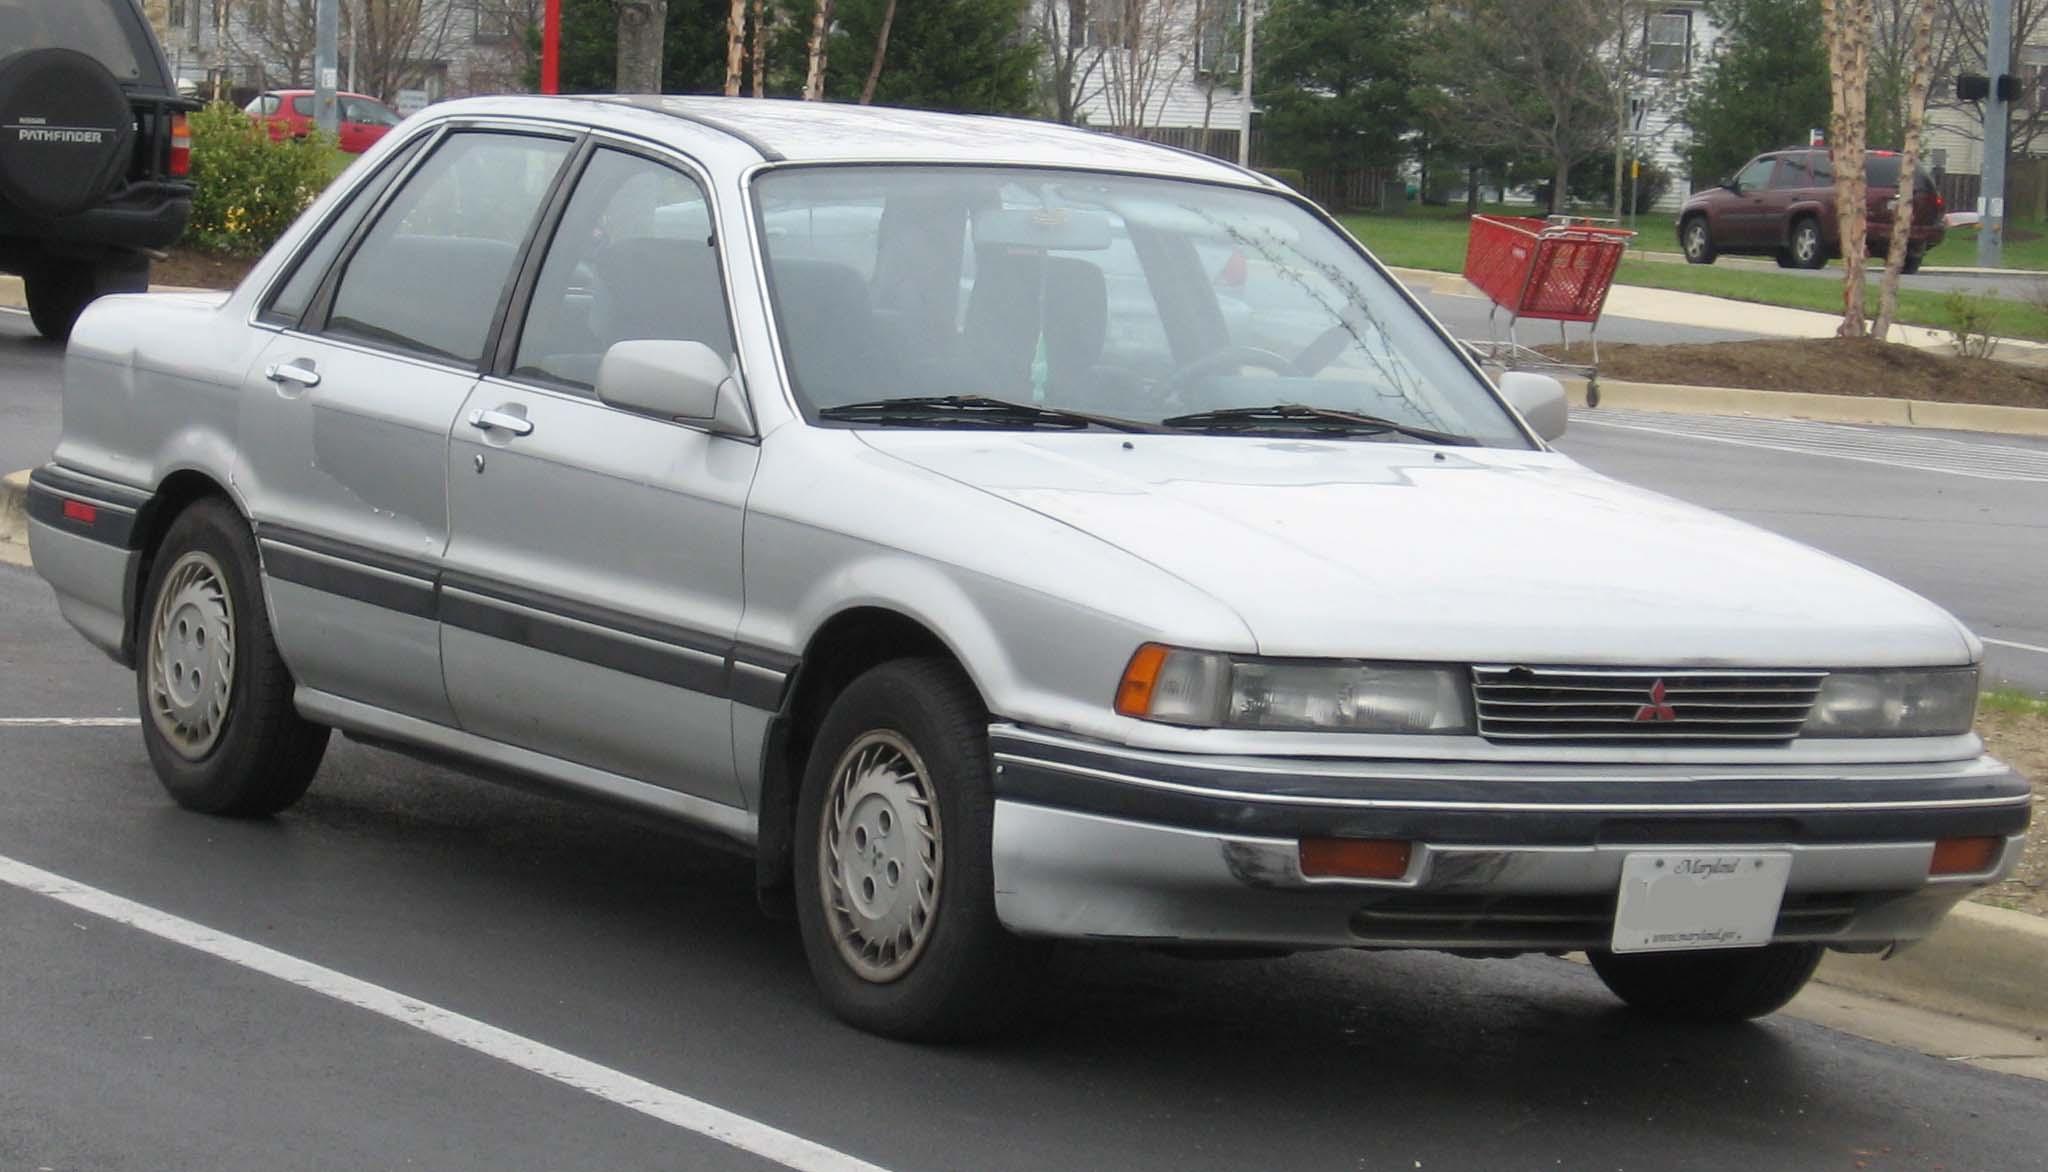 6th Mitsubishi Galant Wallpaper Backgrounds